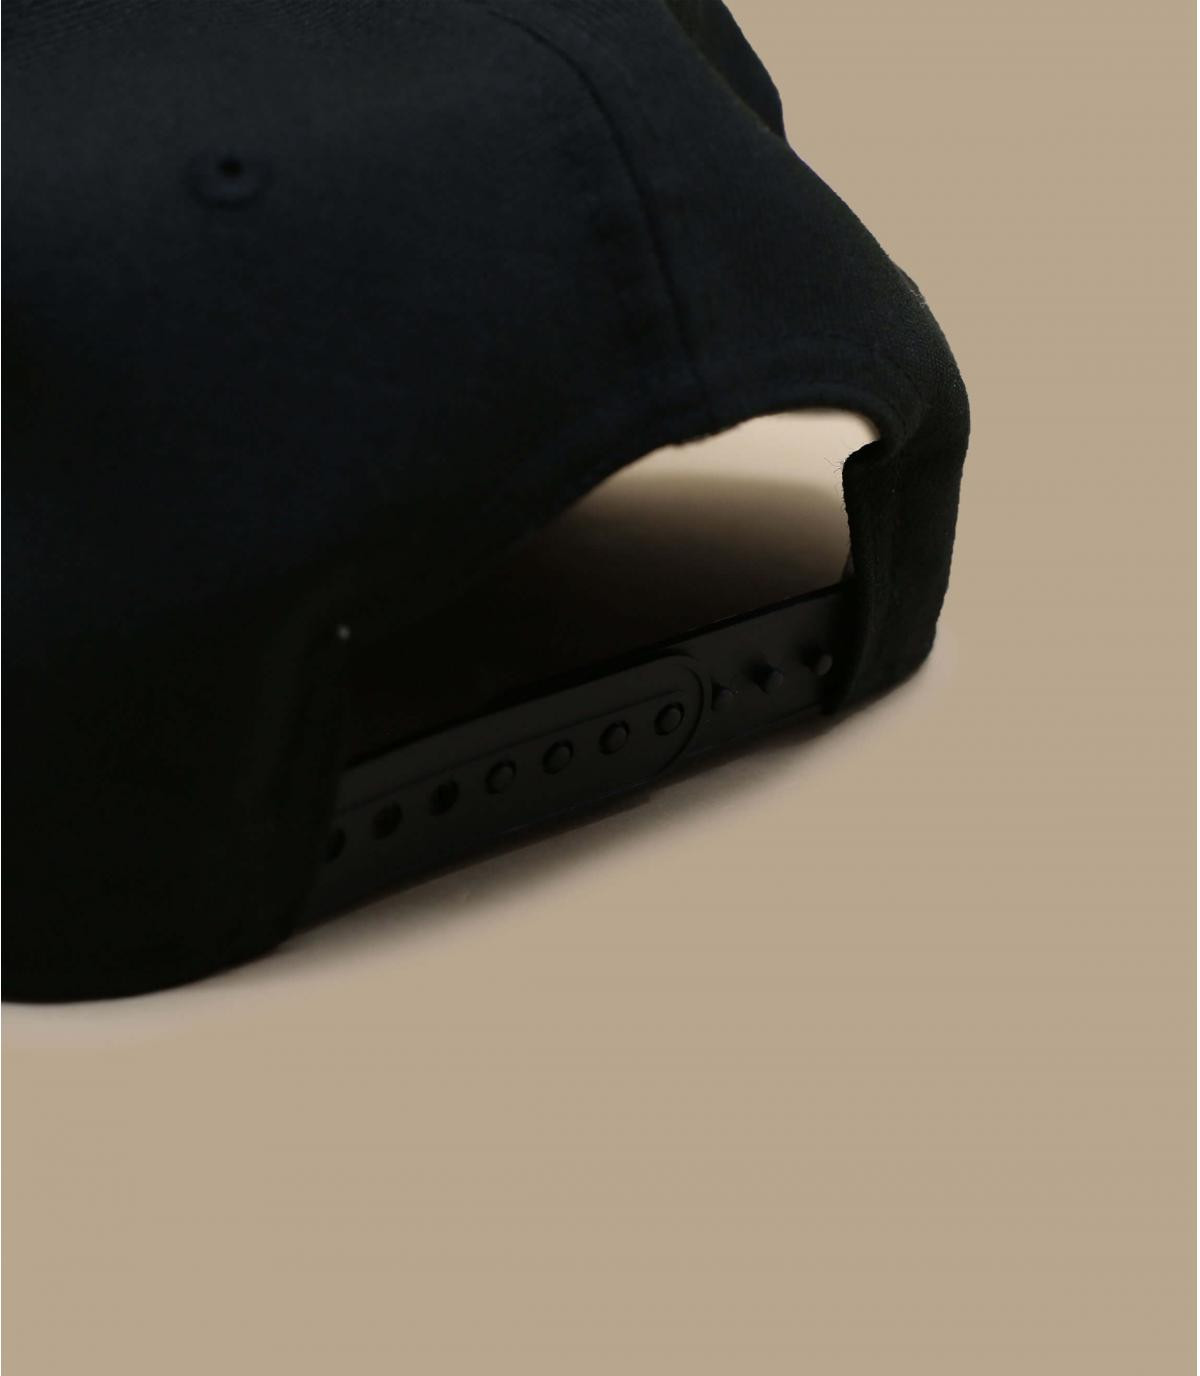 Détails Snapback Quickturn Paisley Bulls 950 black pink - image 4